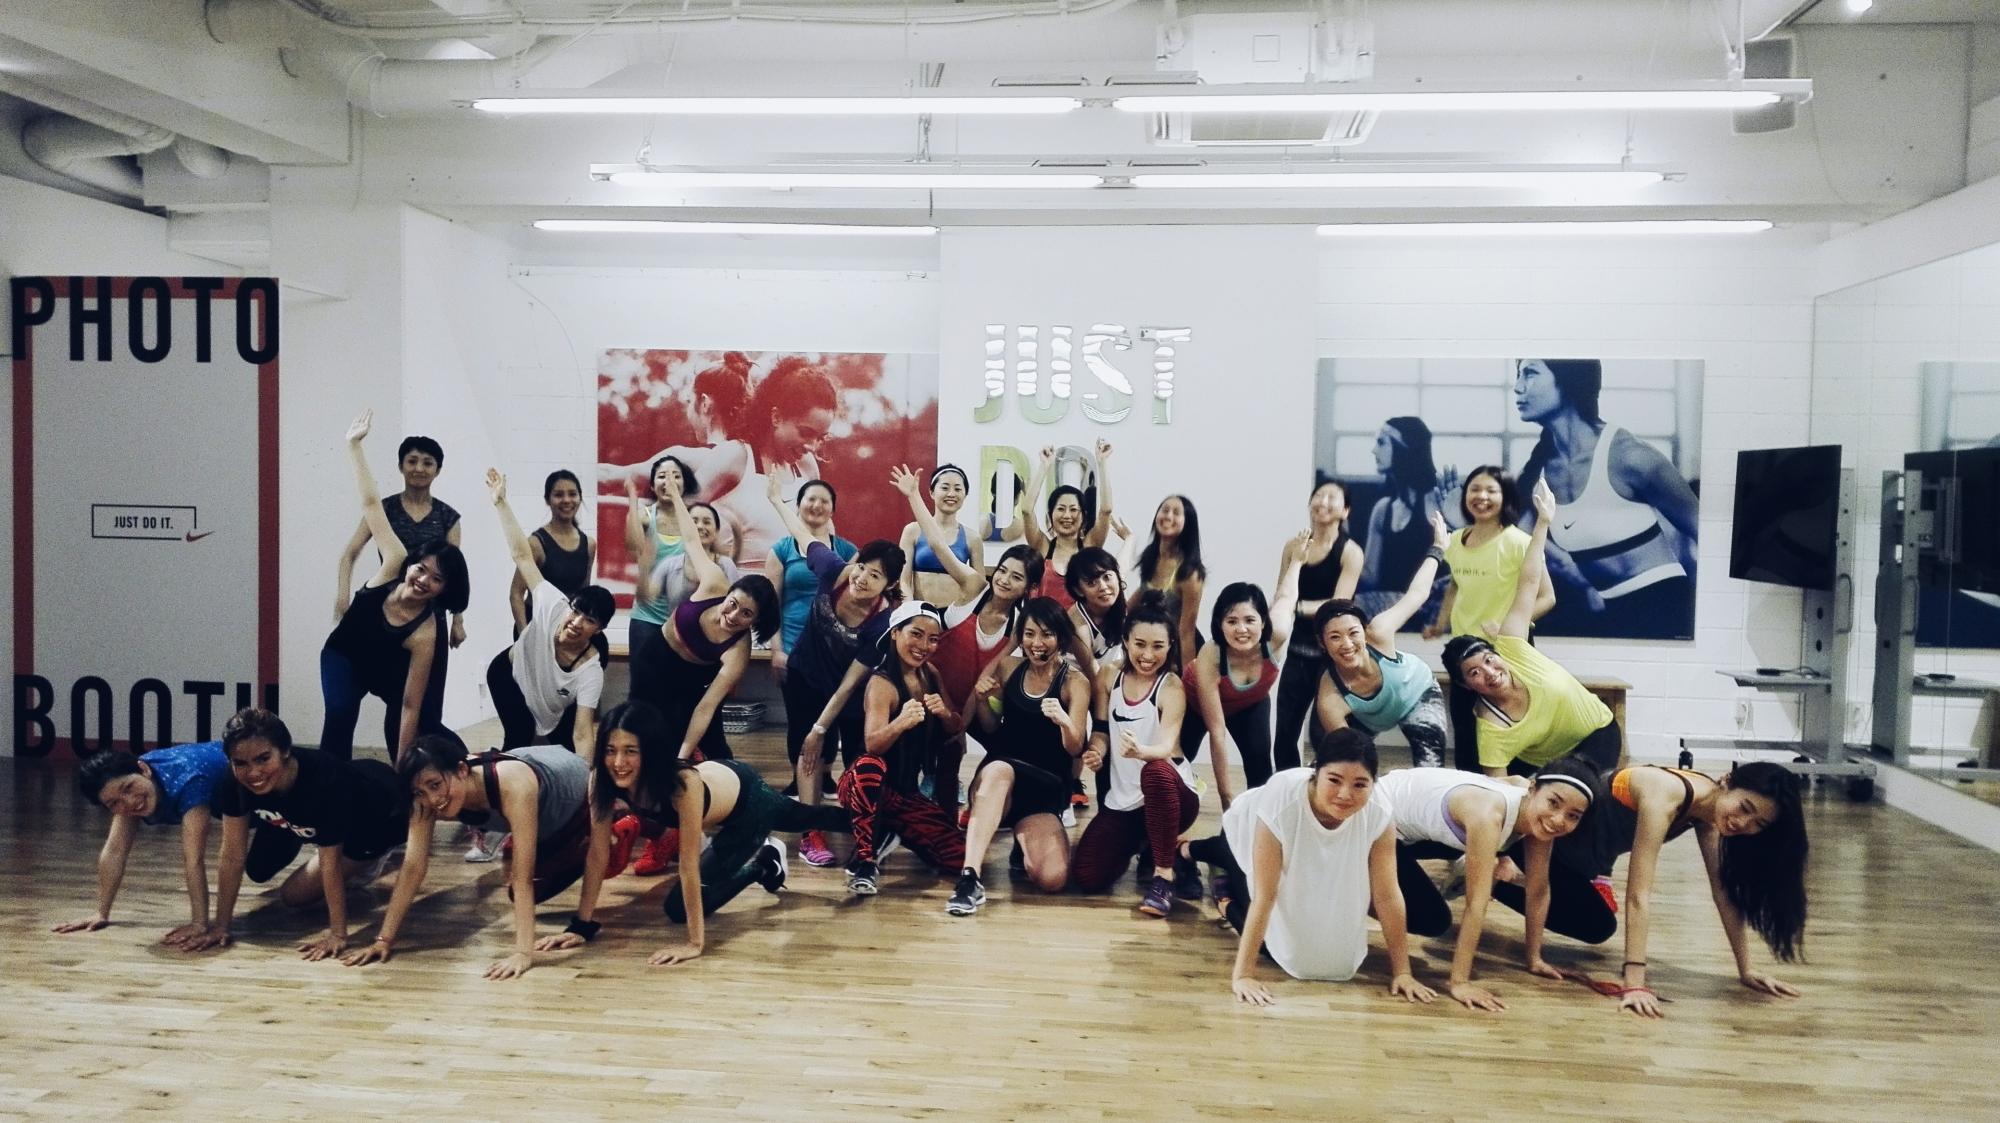 Nike Training Club's pop-up studio in Shibuya